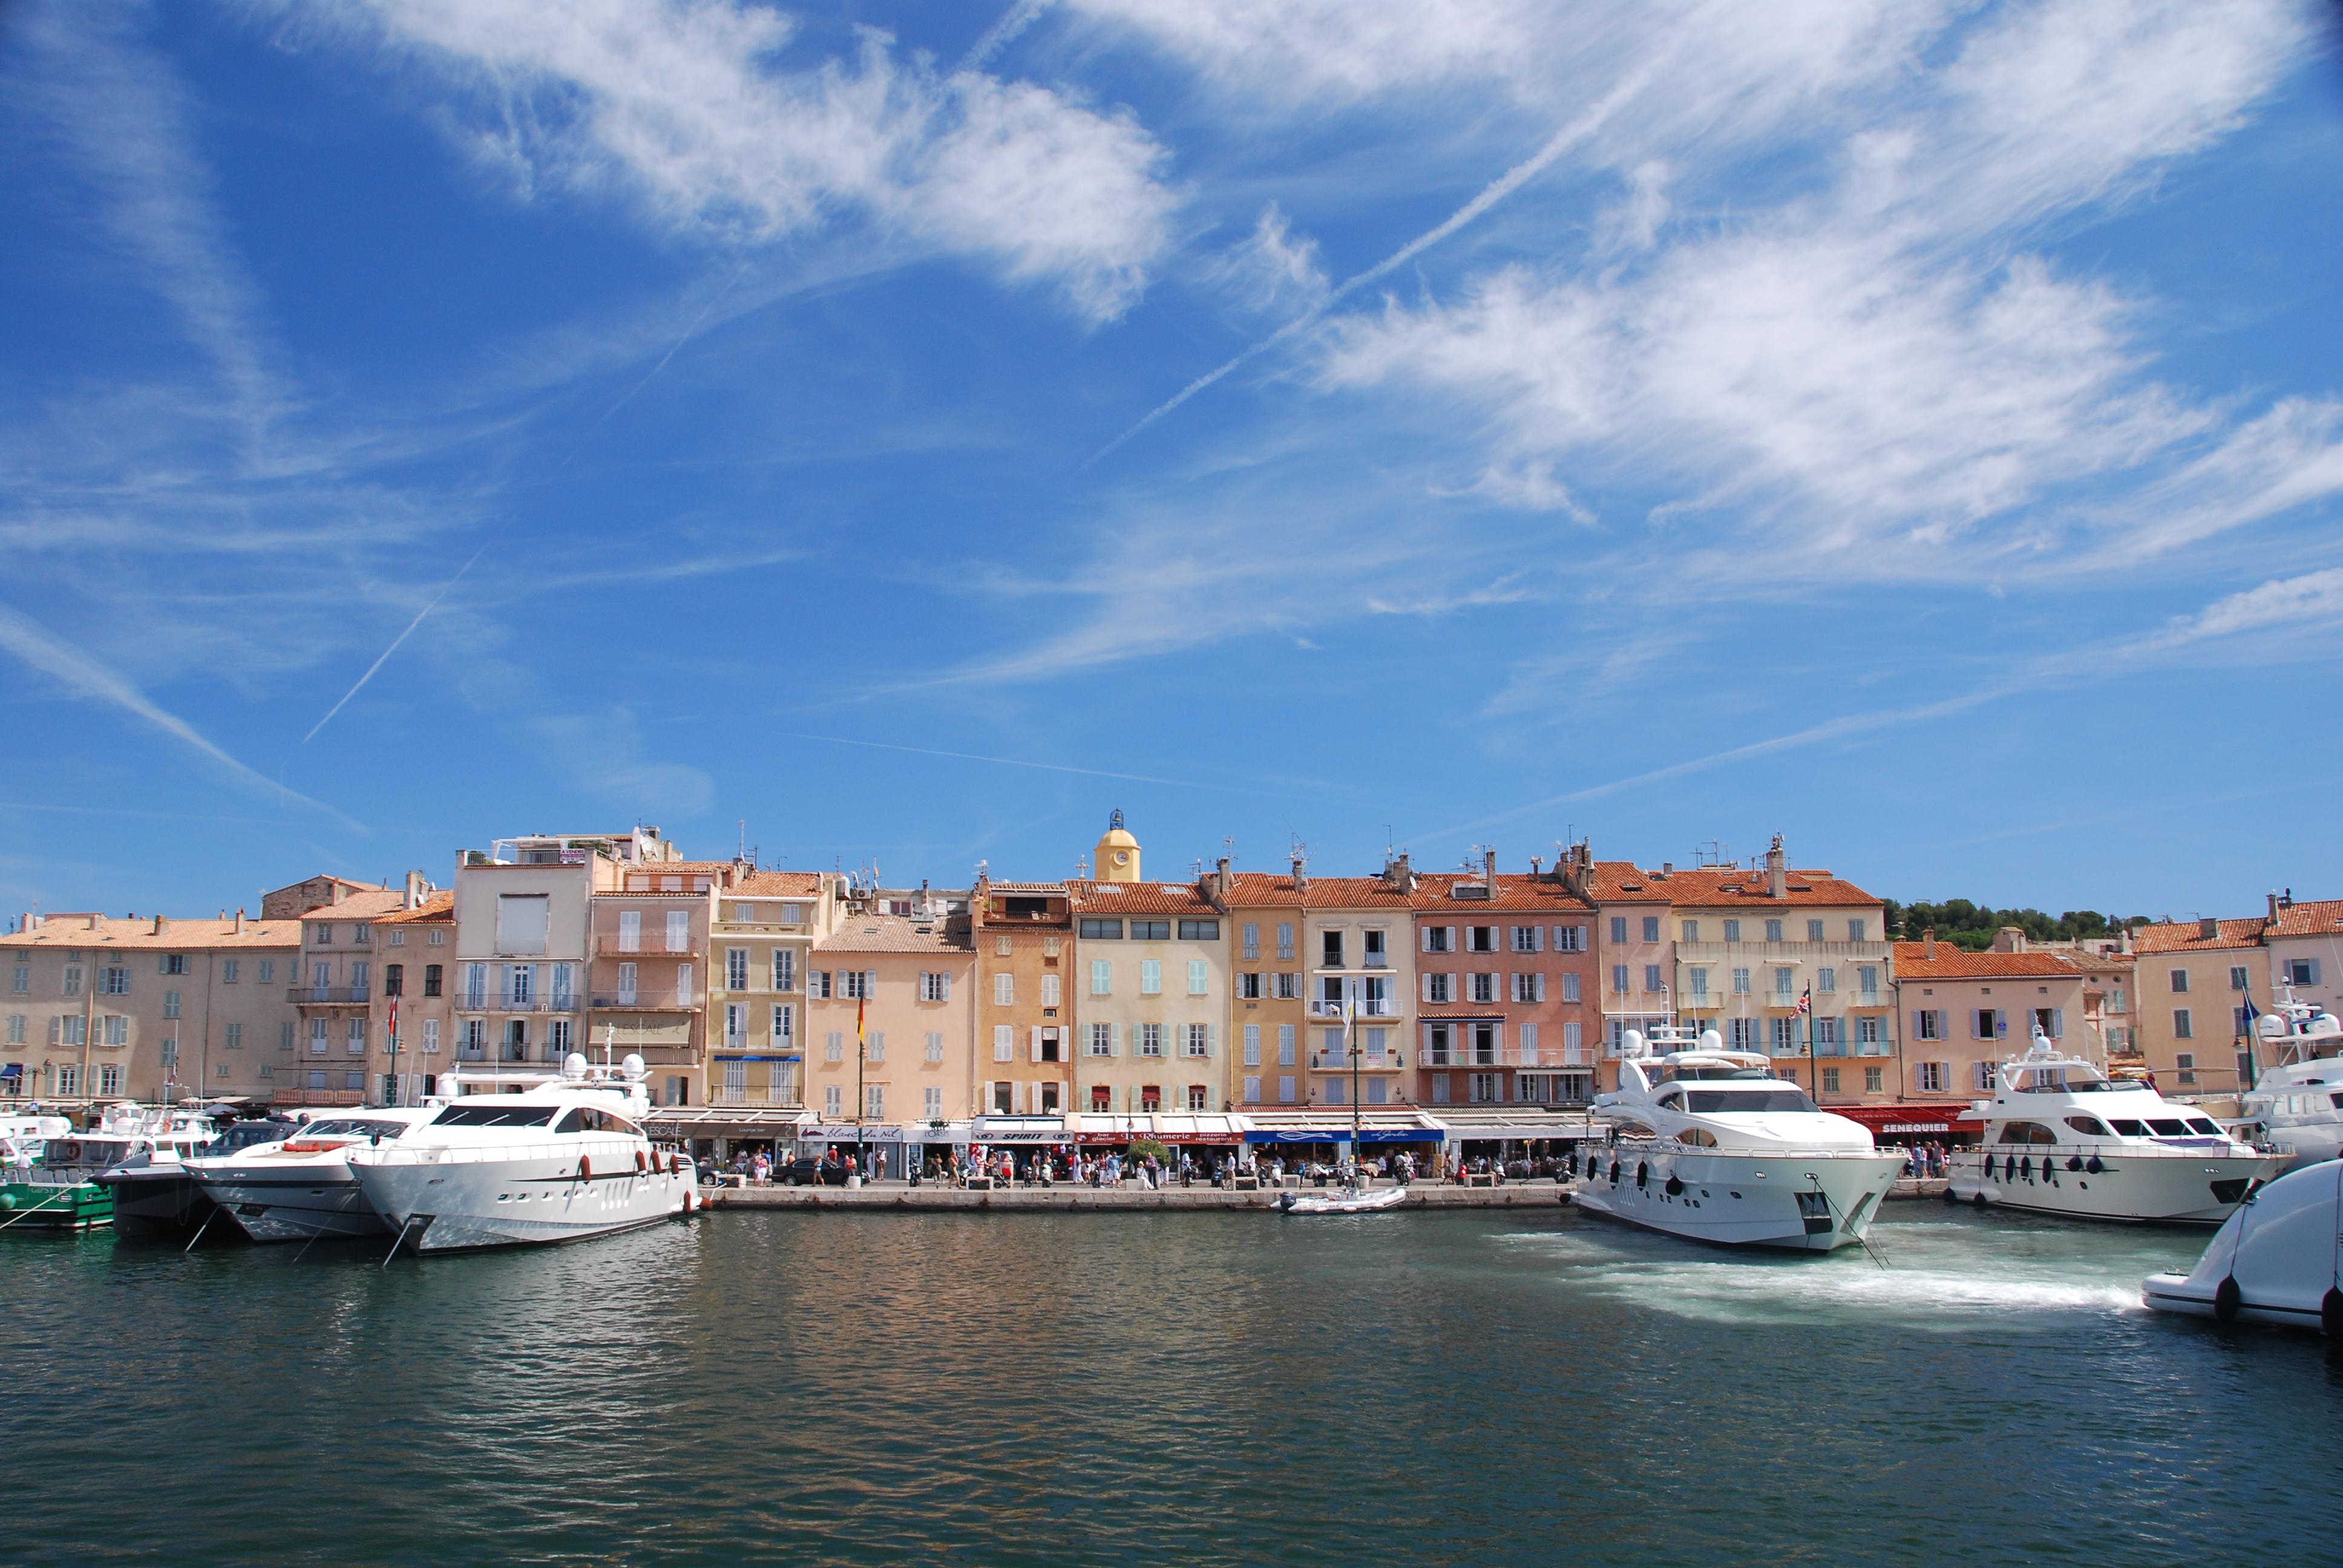 Hotels St Tropez